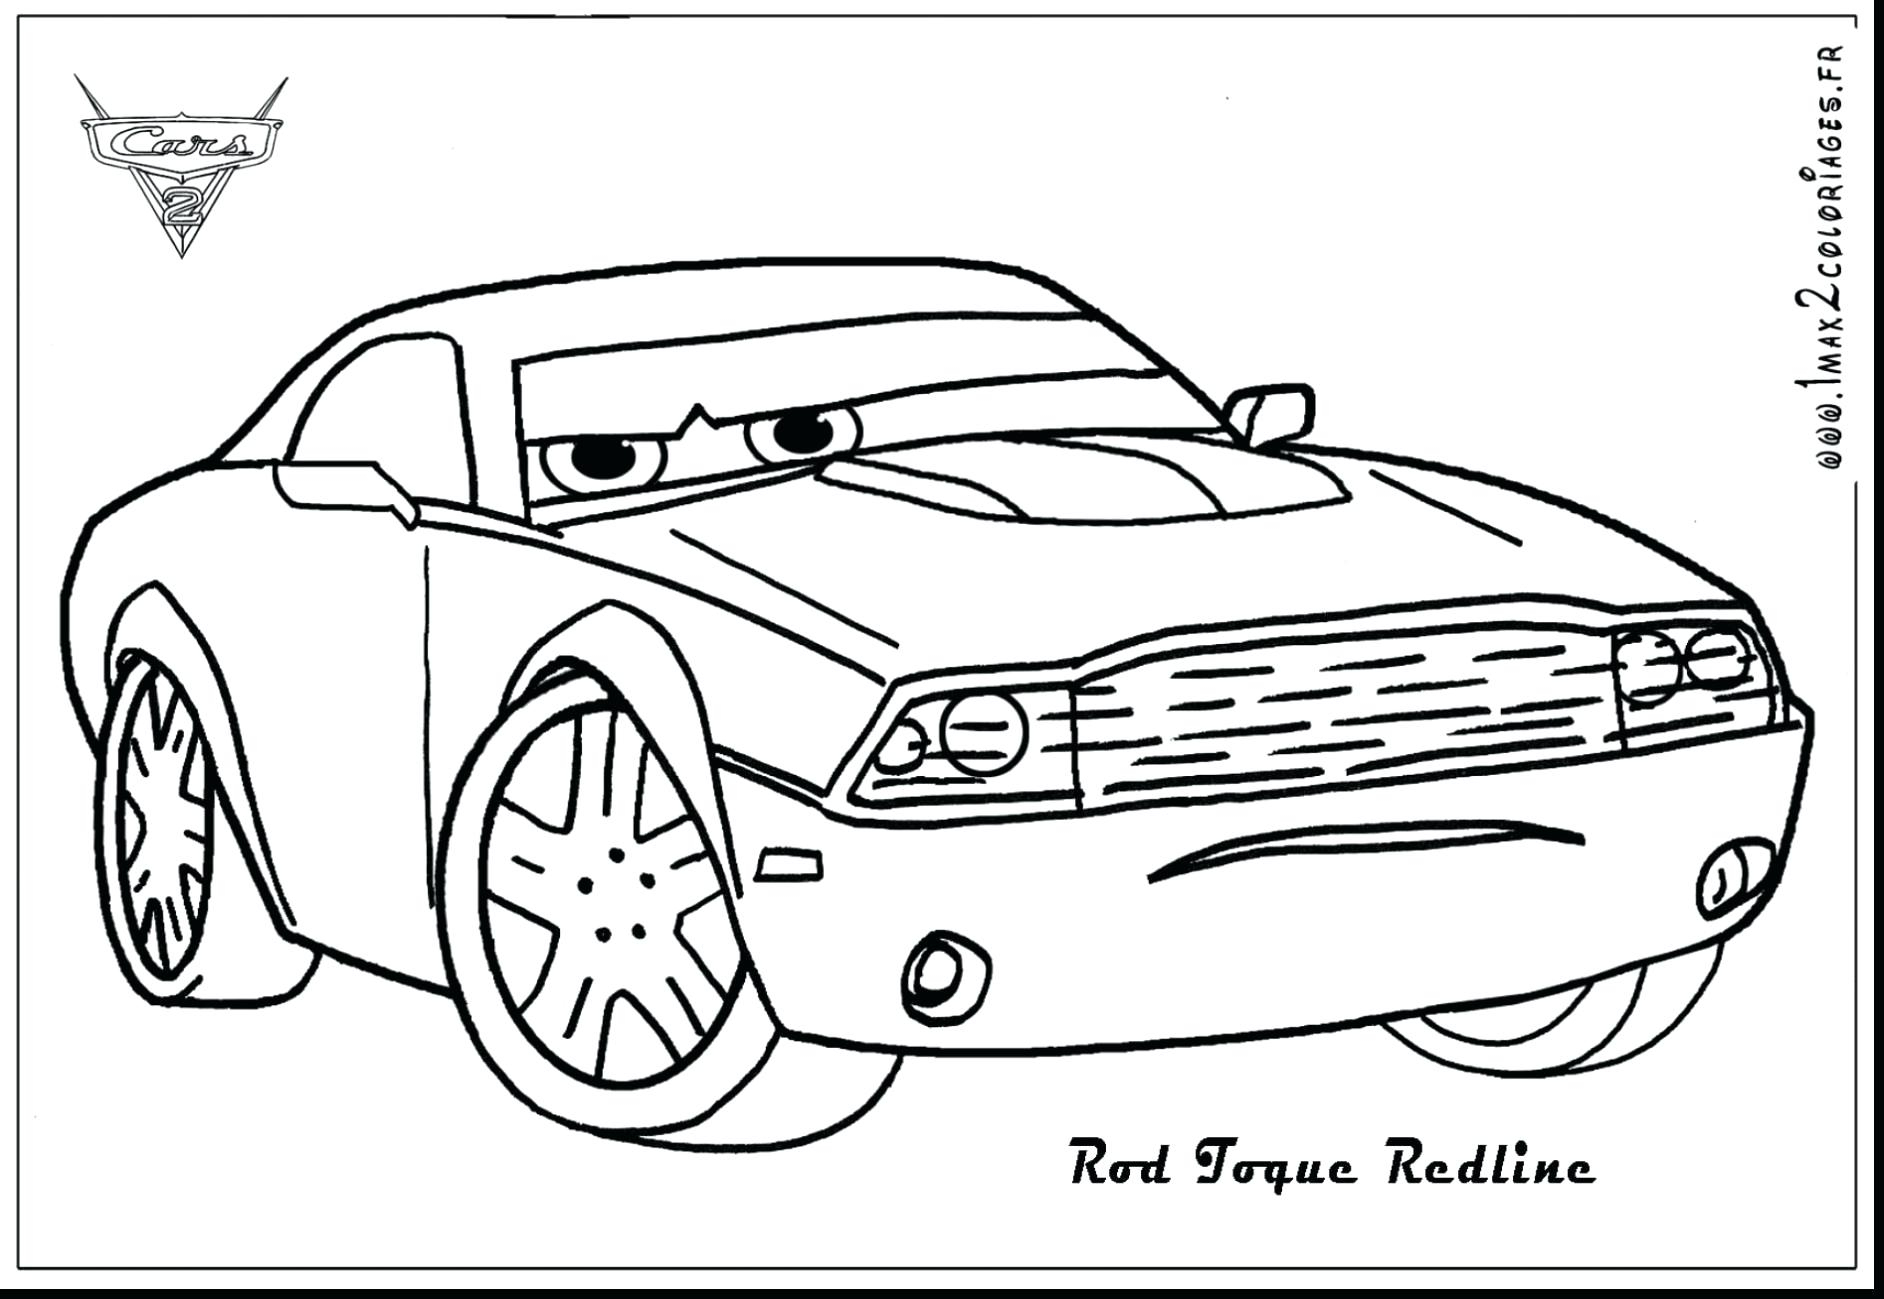 32 Most Preeminent Disney Cars Coloring Book Lightning destiné Coloriage De Flash Mcqueen